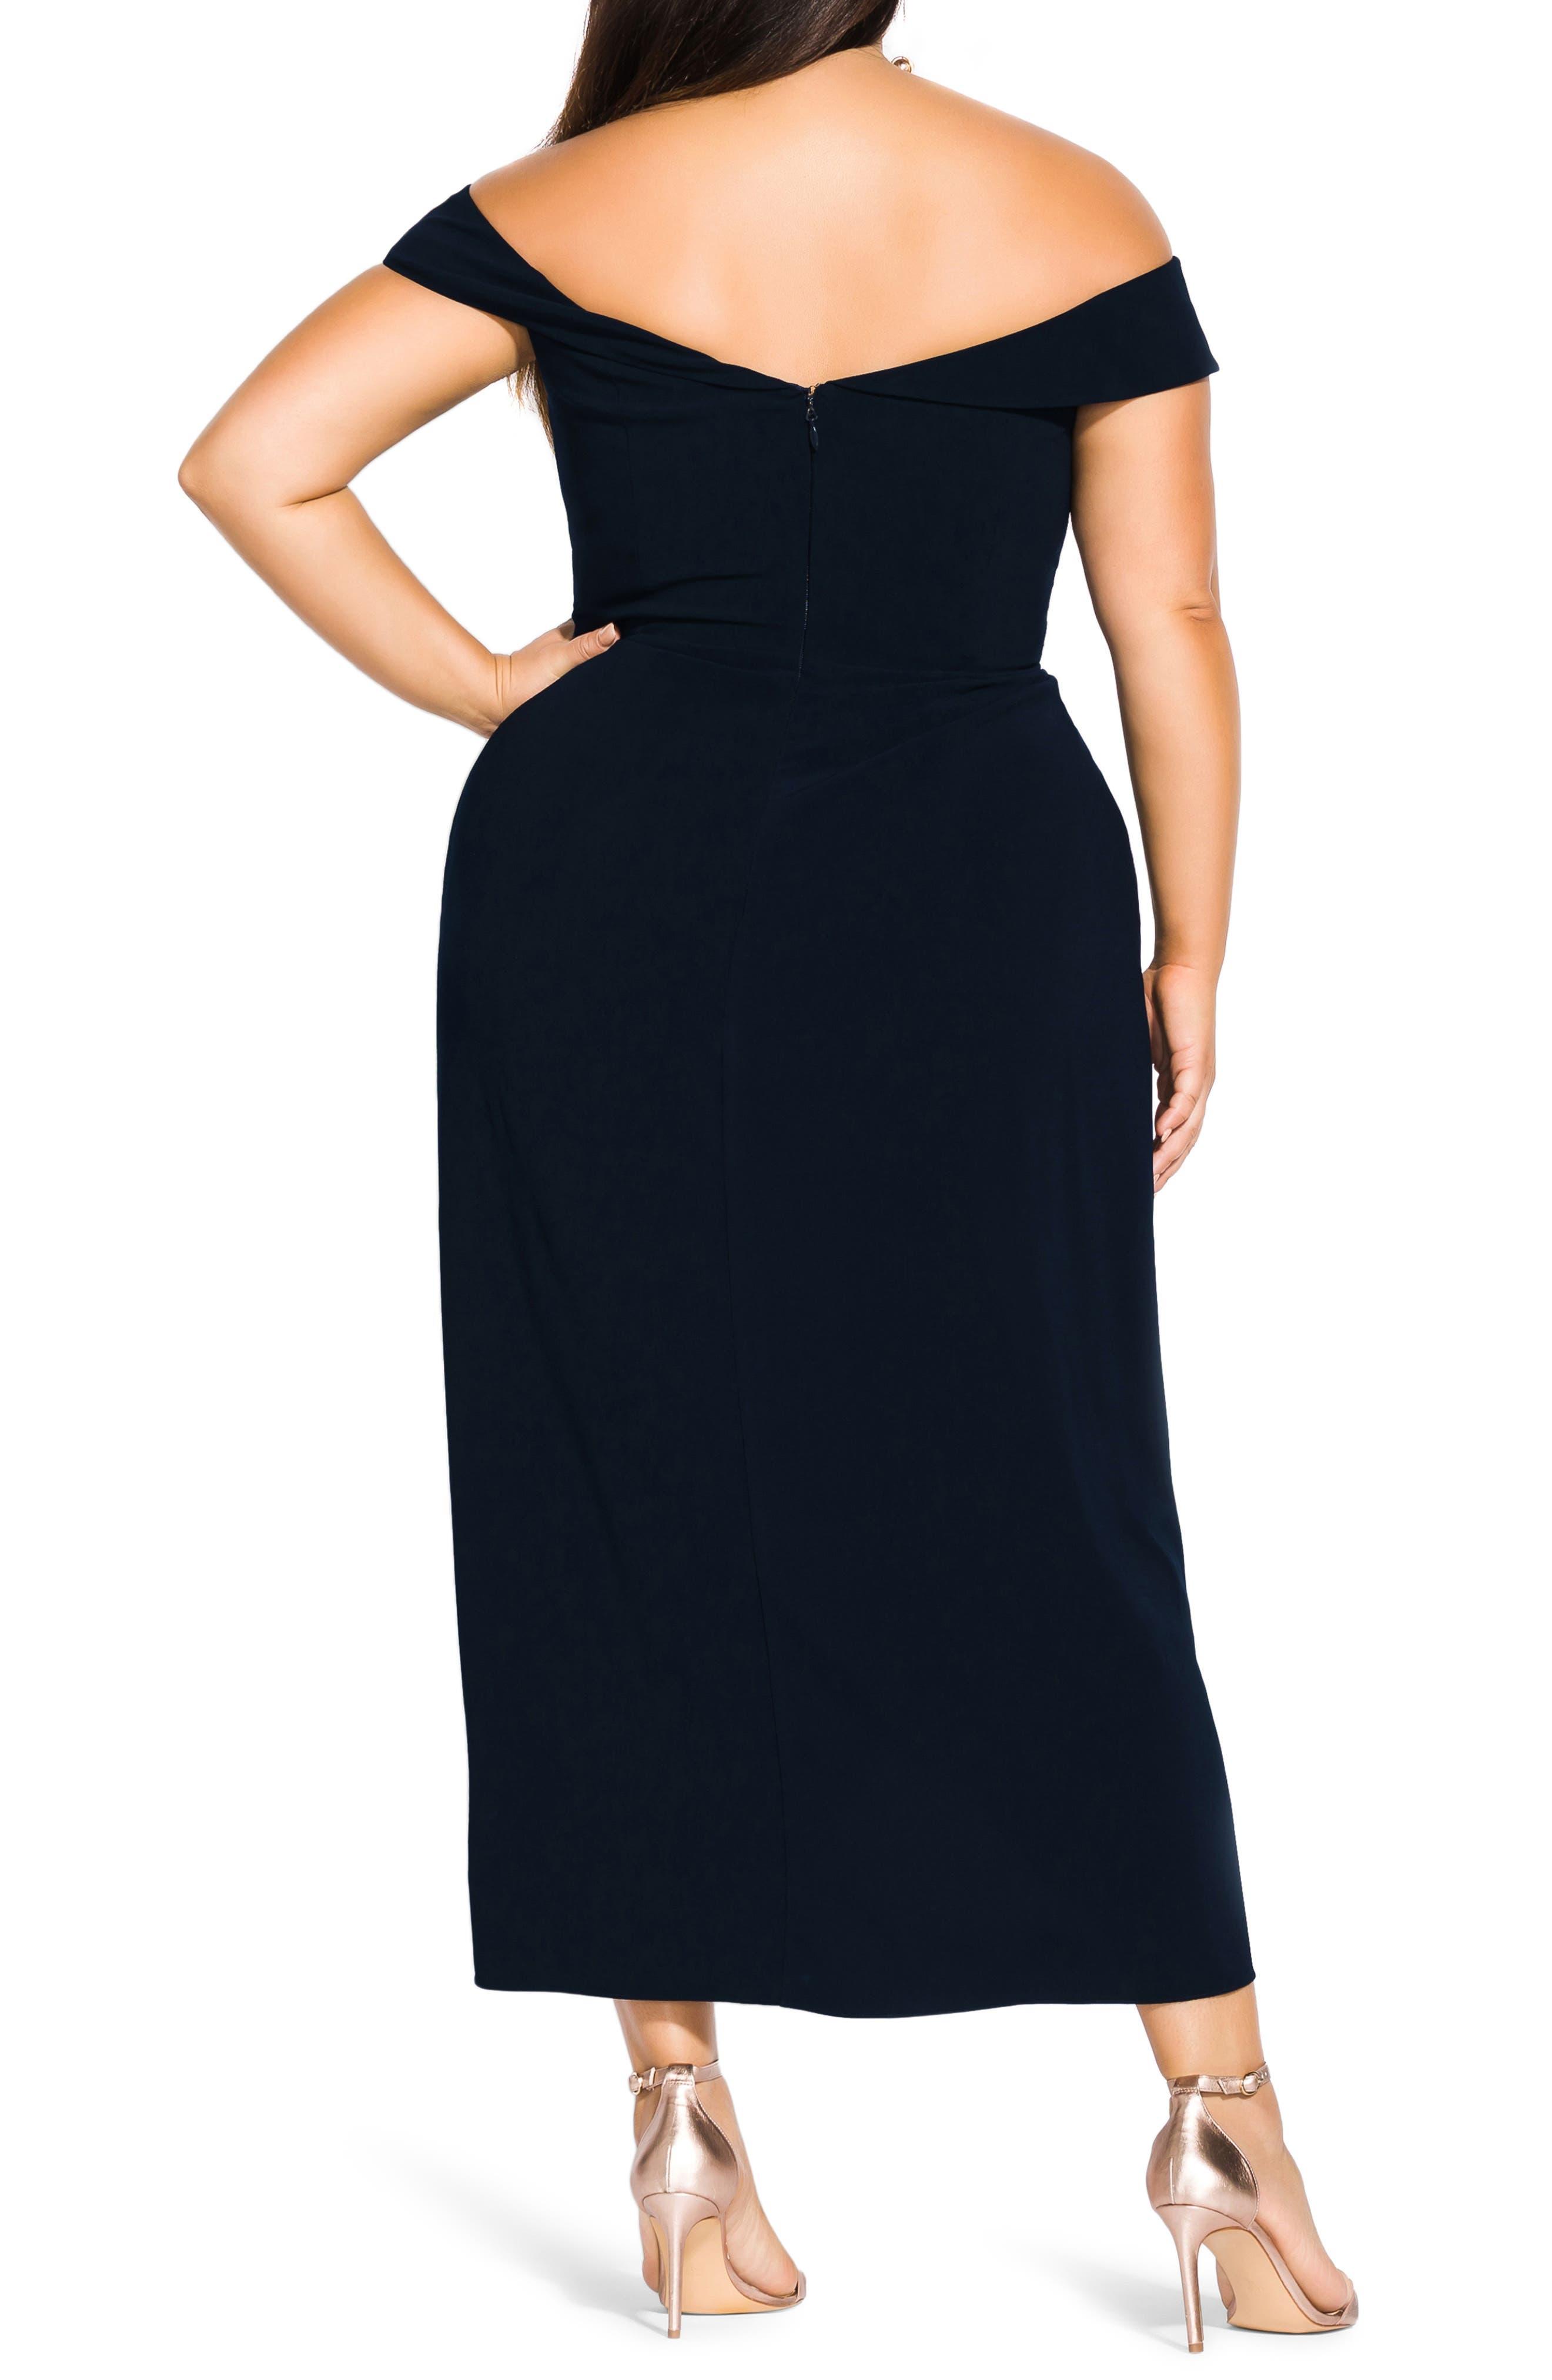 cb15fbe5 Plus-Size Dresses | Nordstrom